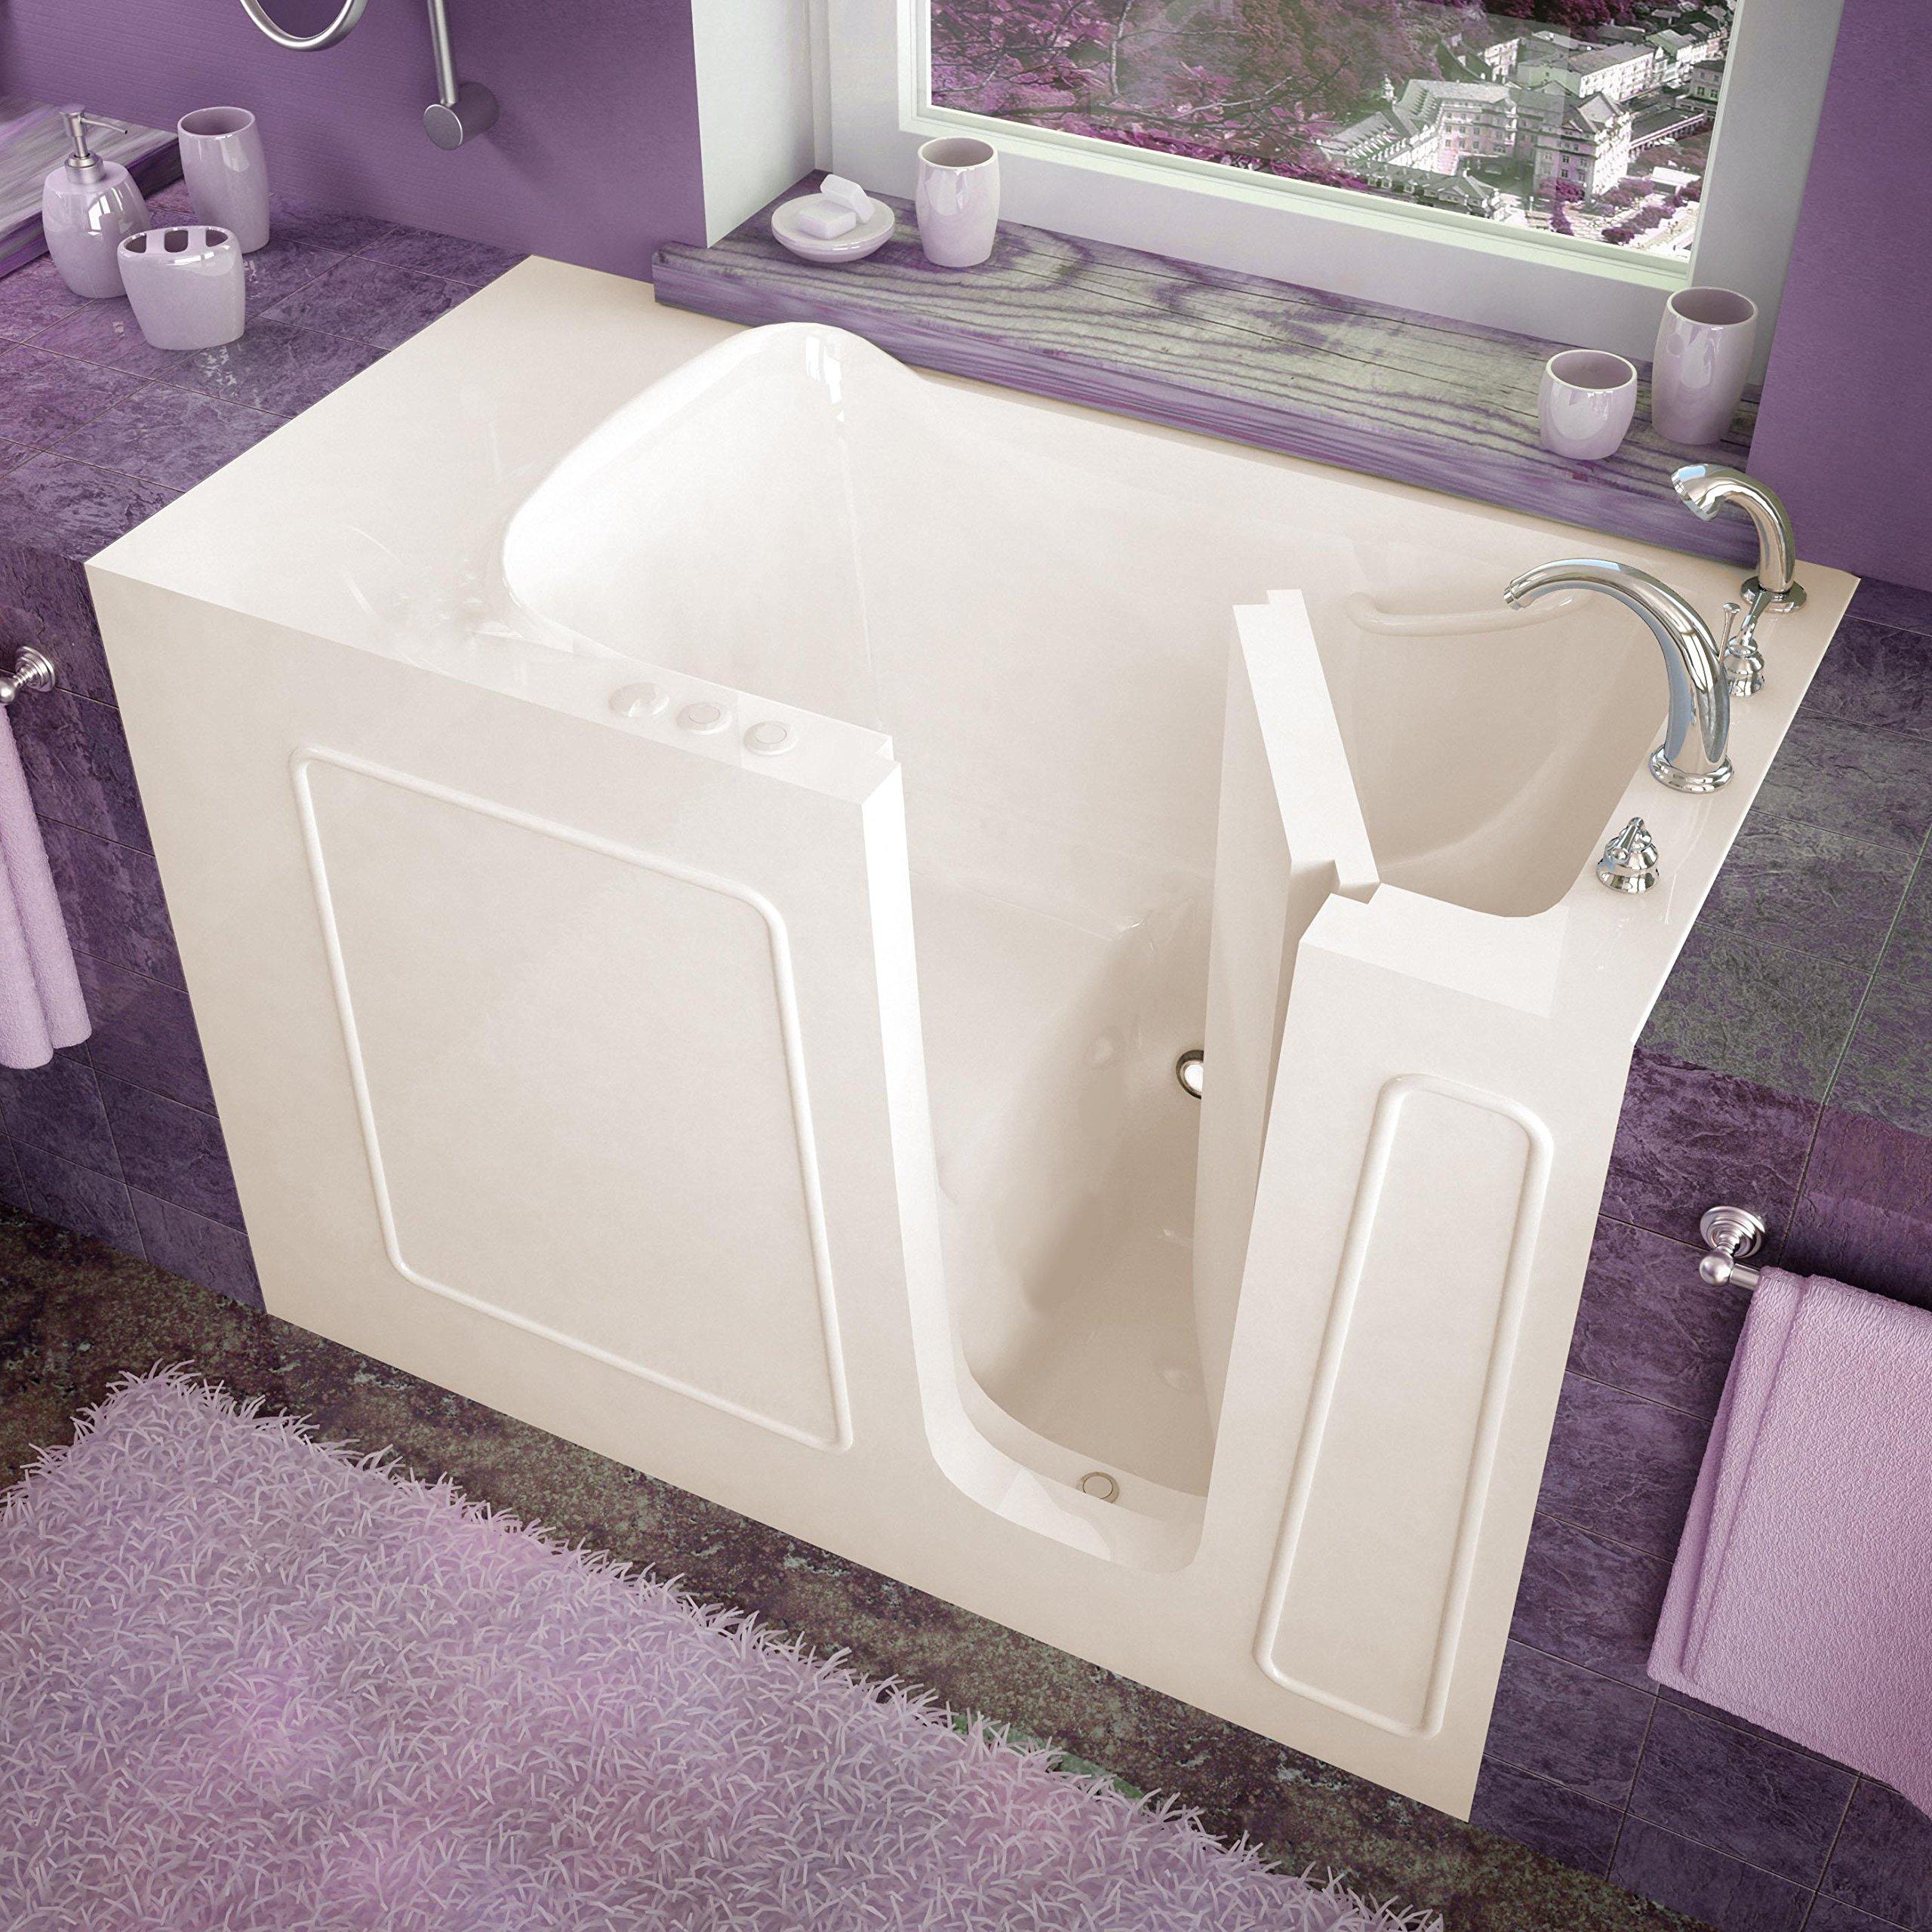 Spa World Venzi Vz2653rbs Rectangular Soaking Walk-In Bathtub, 26x53, Right Drain, Biscuit